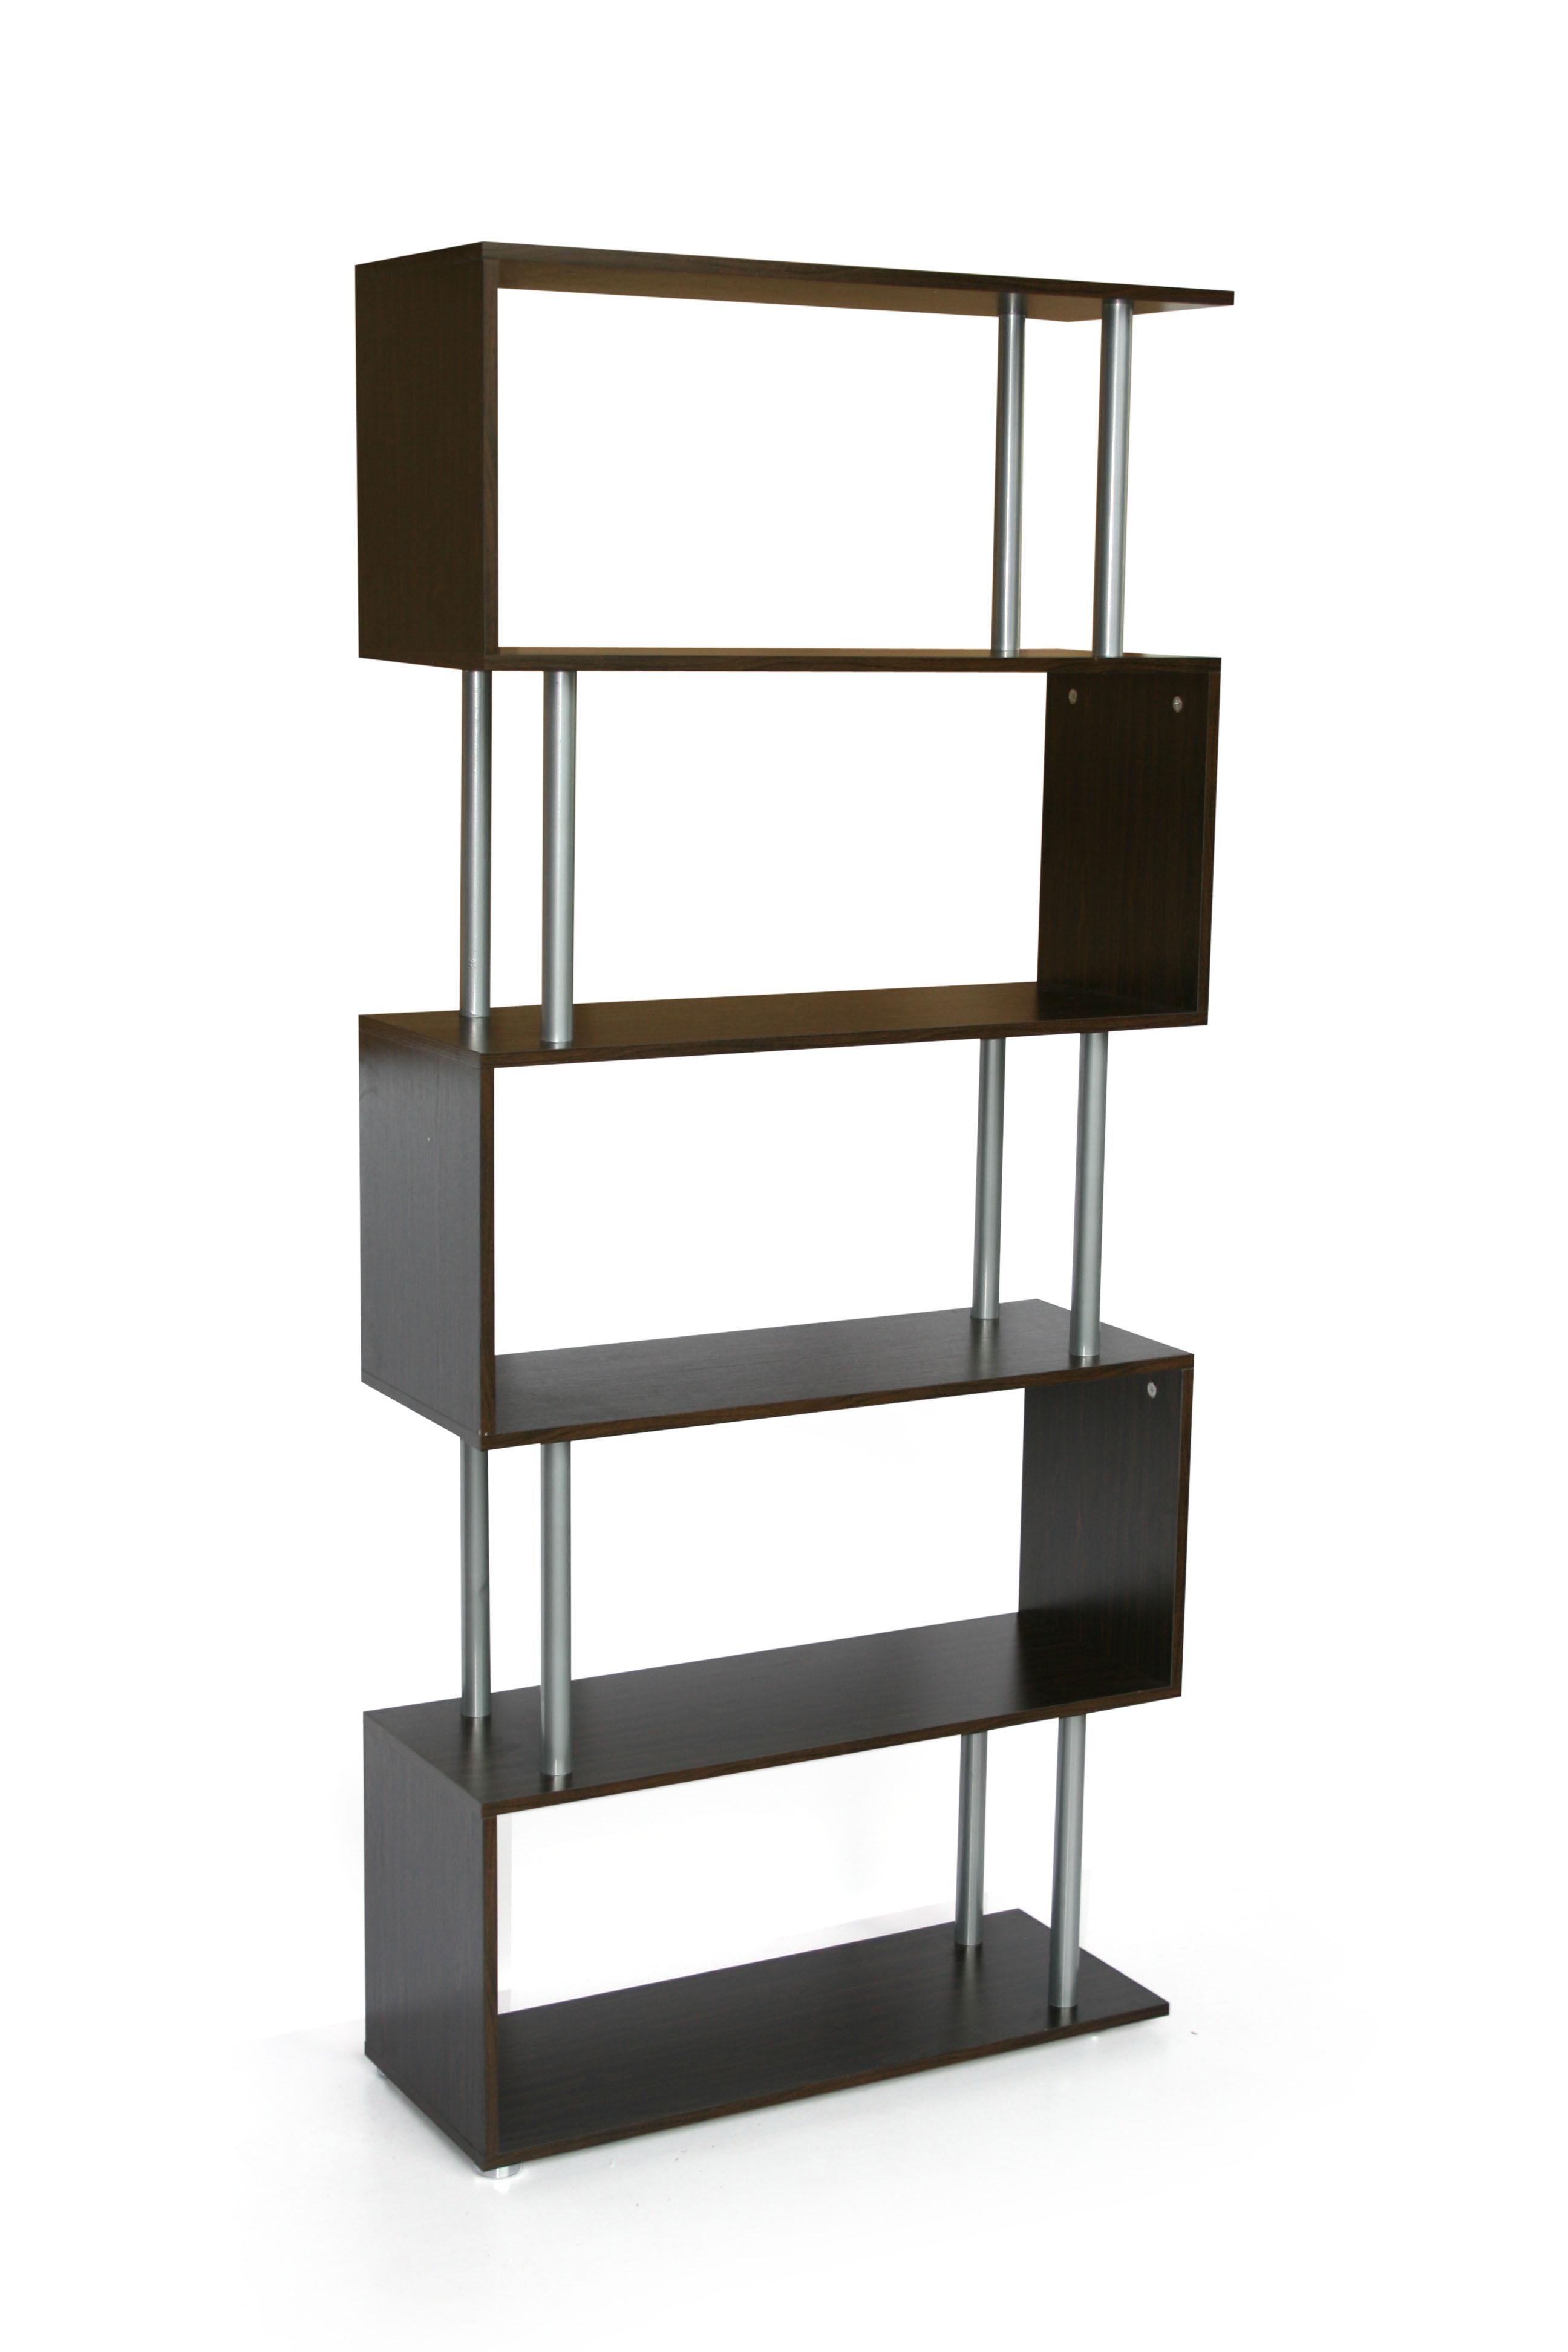 s-shaped-5-shelf-bookshelfblack